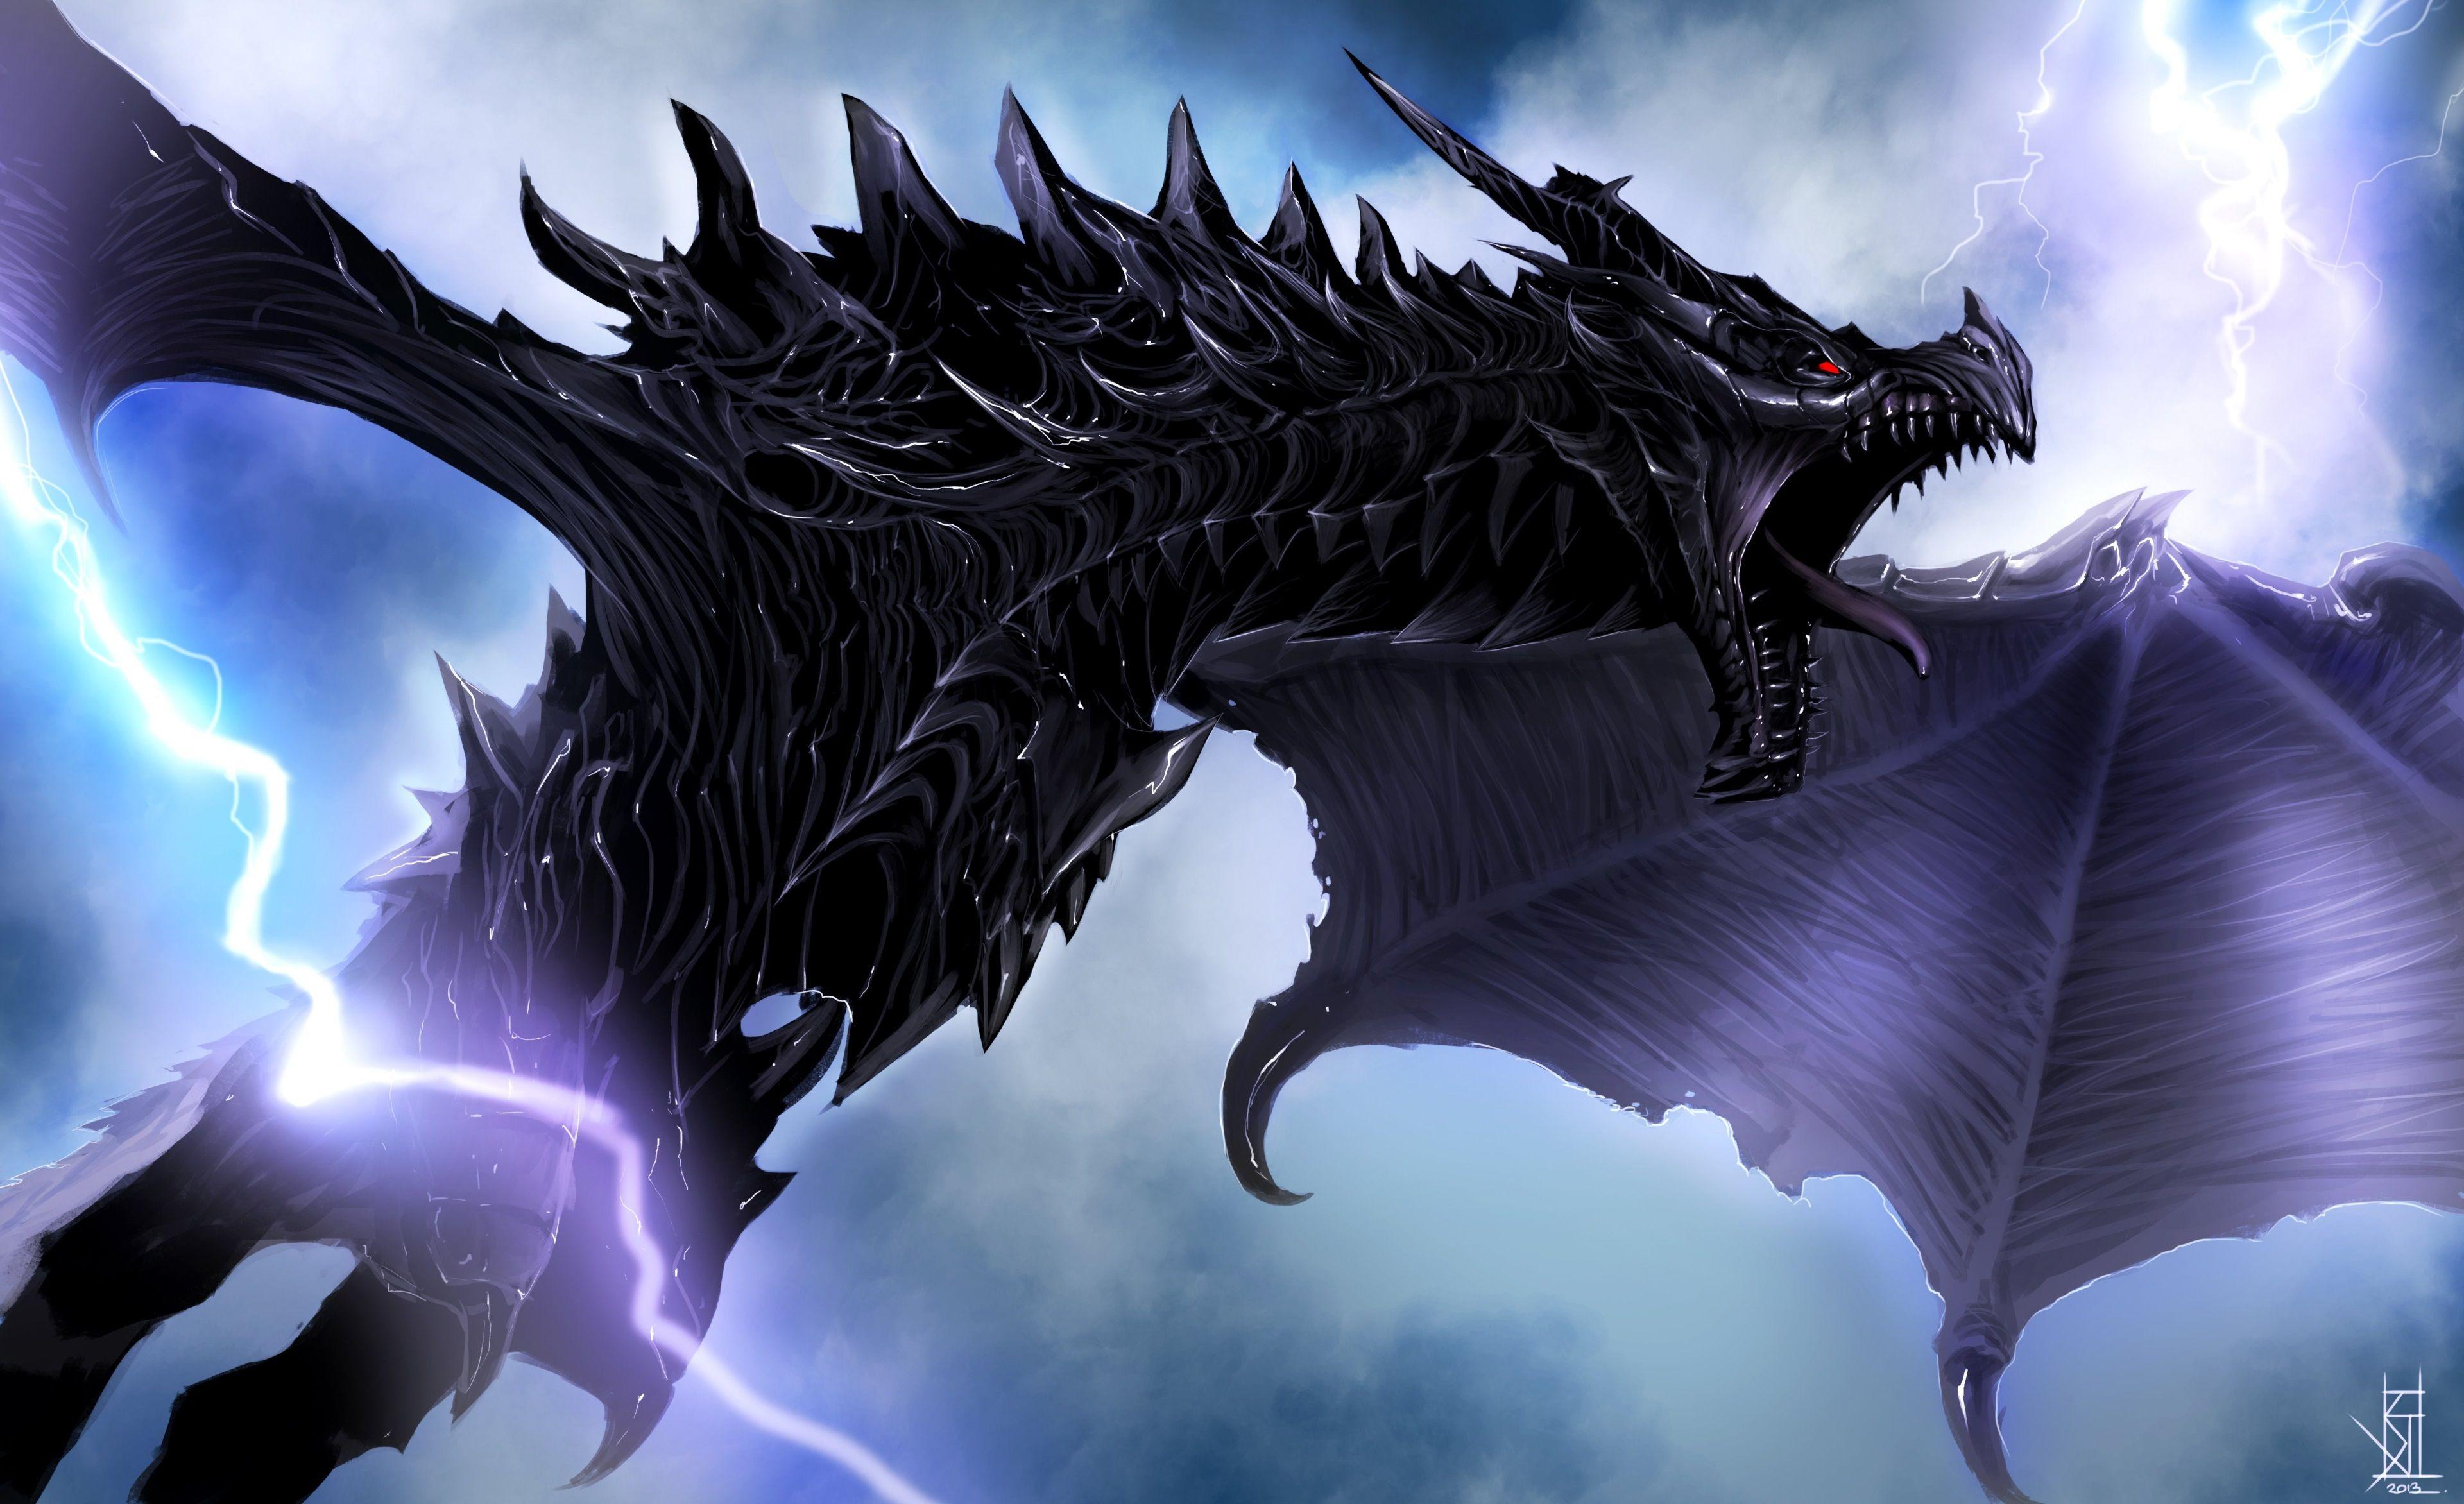 3840x2344 Skyrim Dragon 4k Cool Hd Wallpaper Skyrim Dragon Skyrim Wallpaper Lightning Dragon